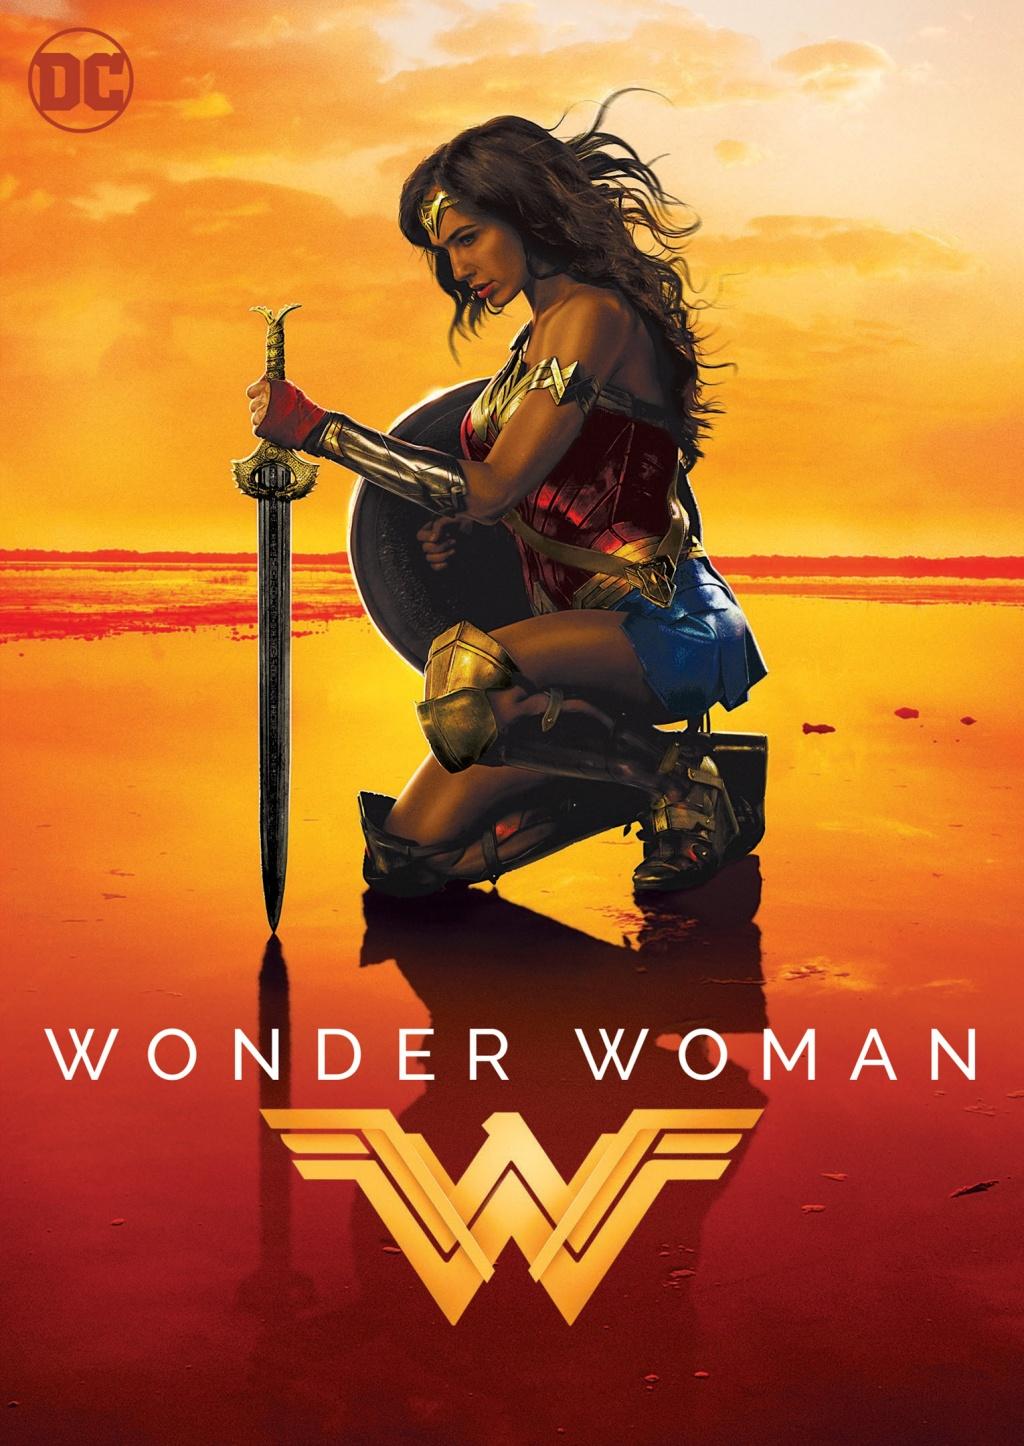 Wonder Woman - Wonder Woman (2017) - Menart